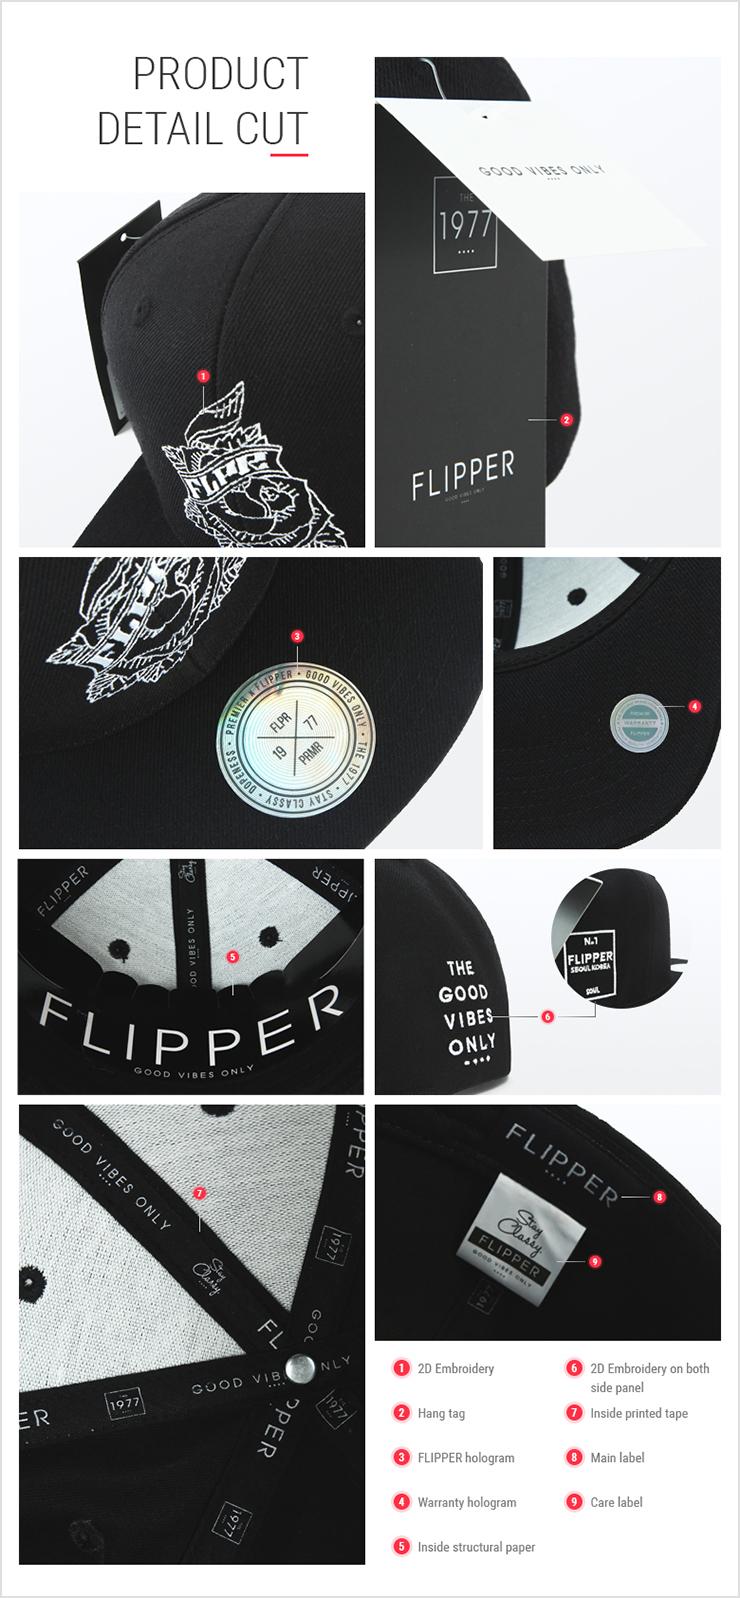 [ PREMIER ] [Premier] Flipper Snapback Rose Black (FL207)